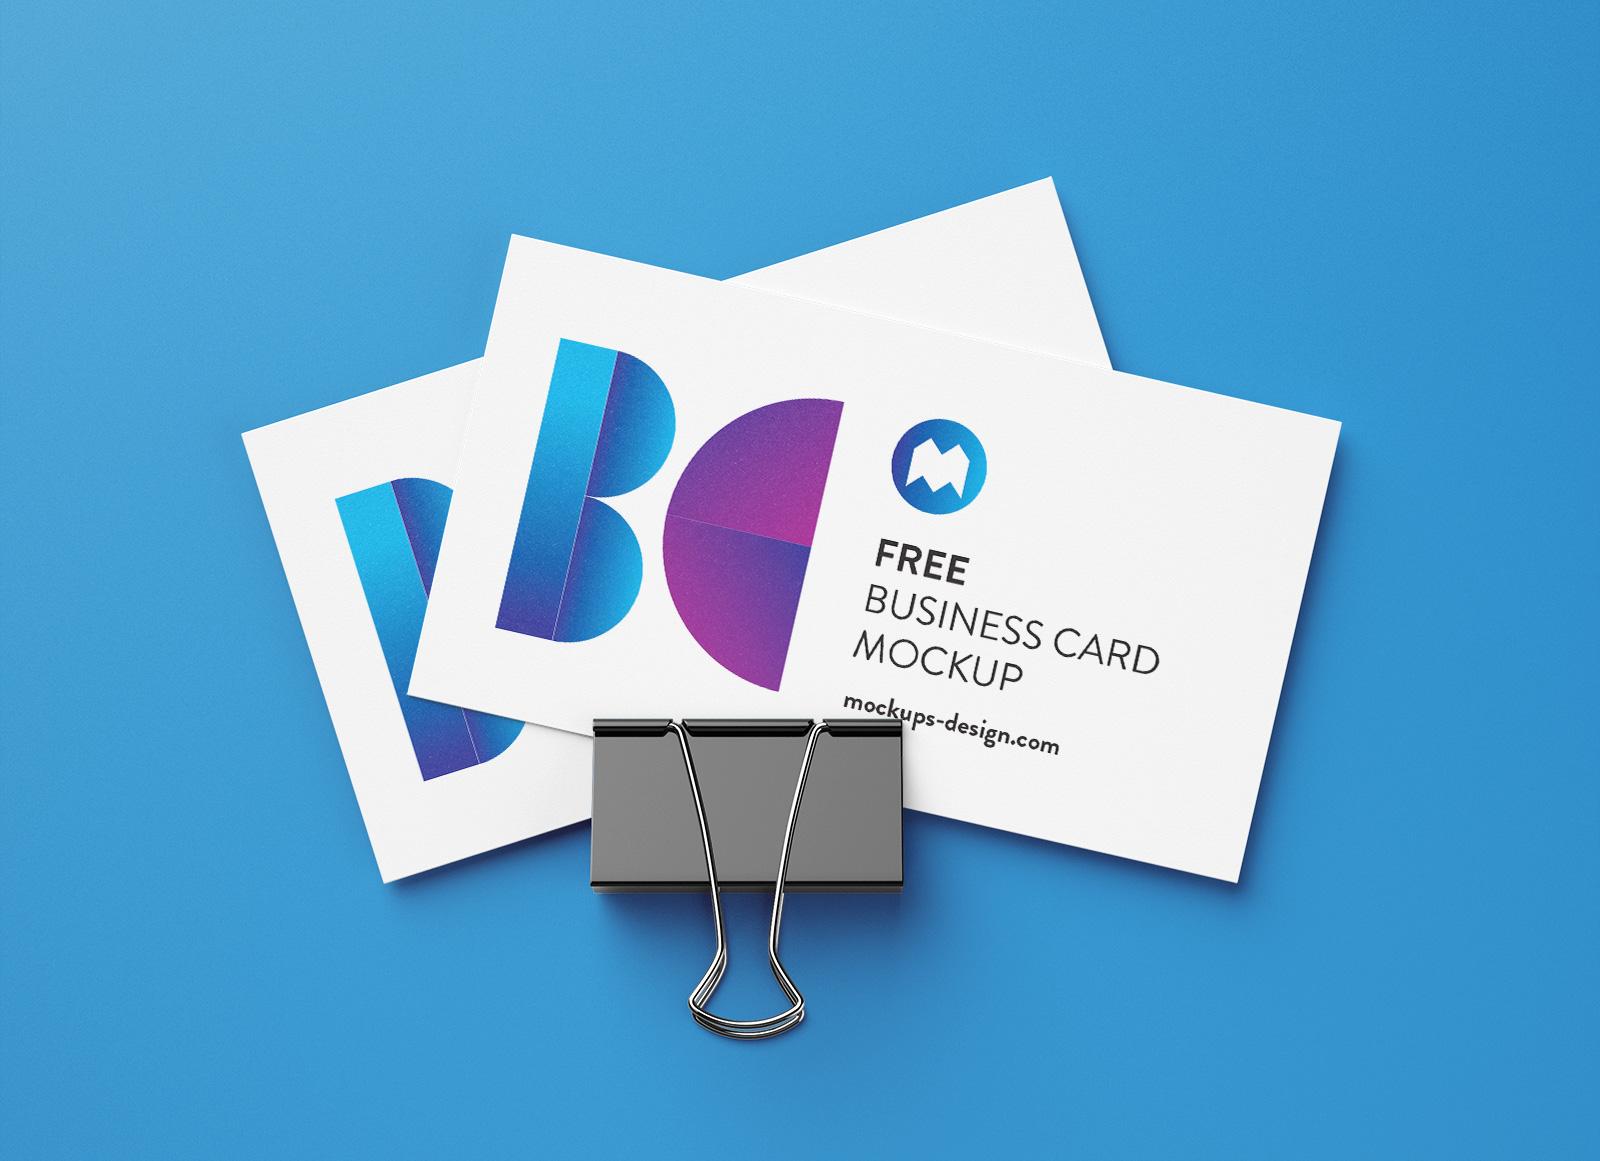 Free-Binder-Clip-Business-Card-Mockup-PSD-Set-3